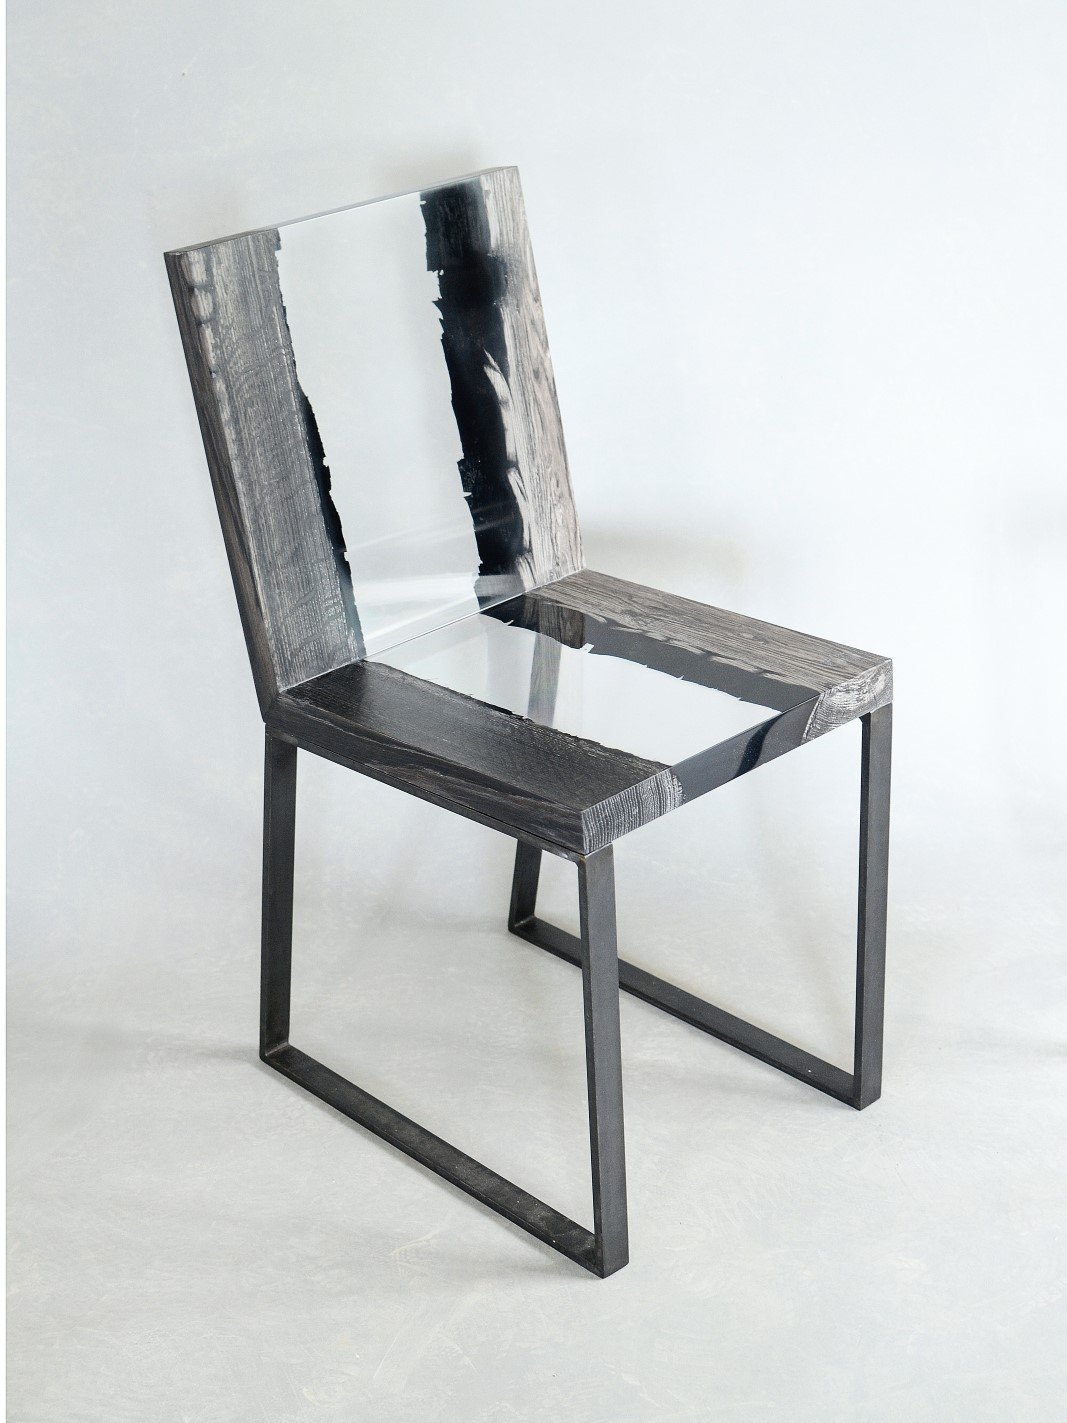 alcarol - Peatland chair_1